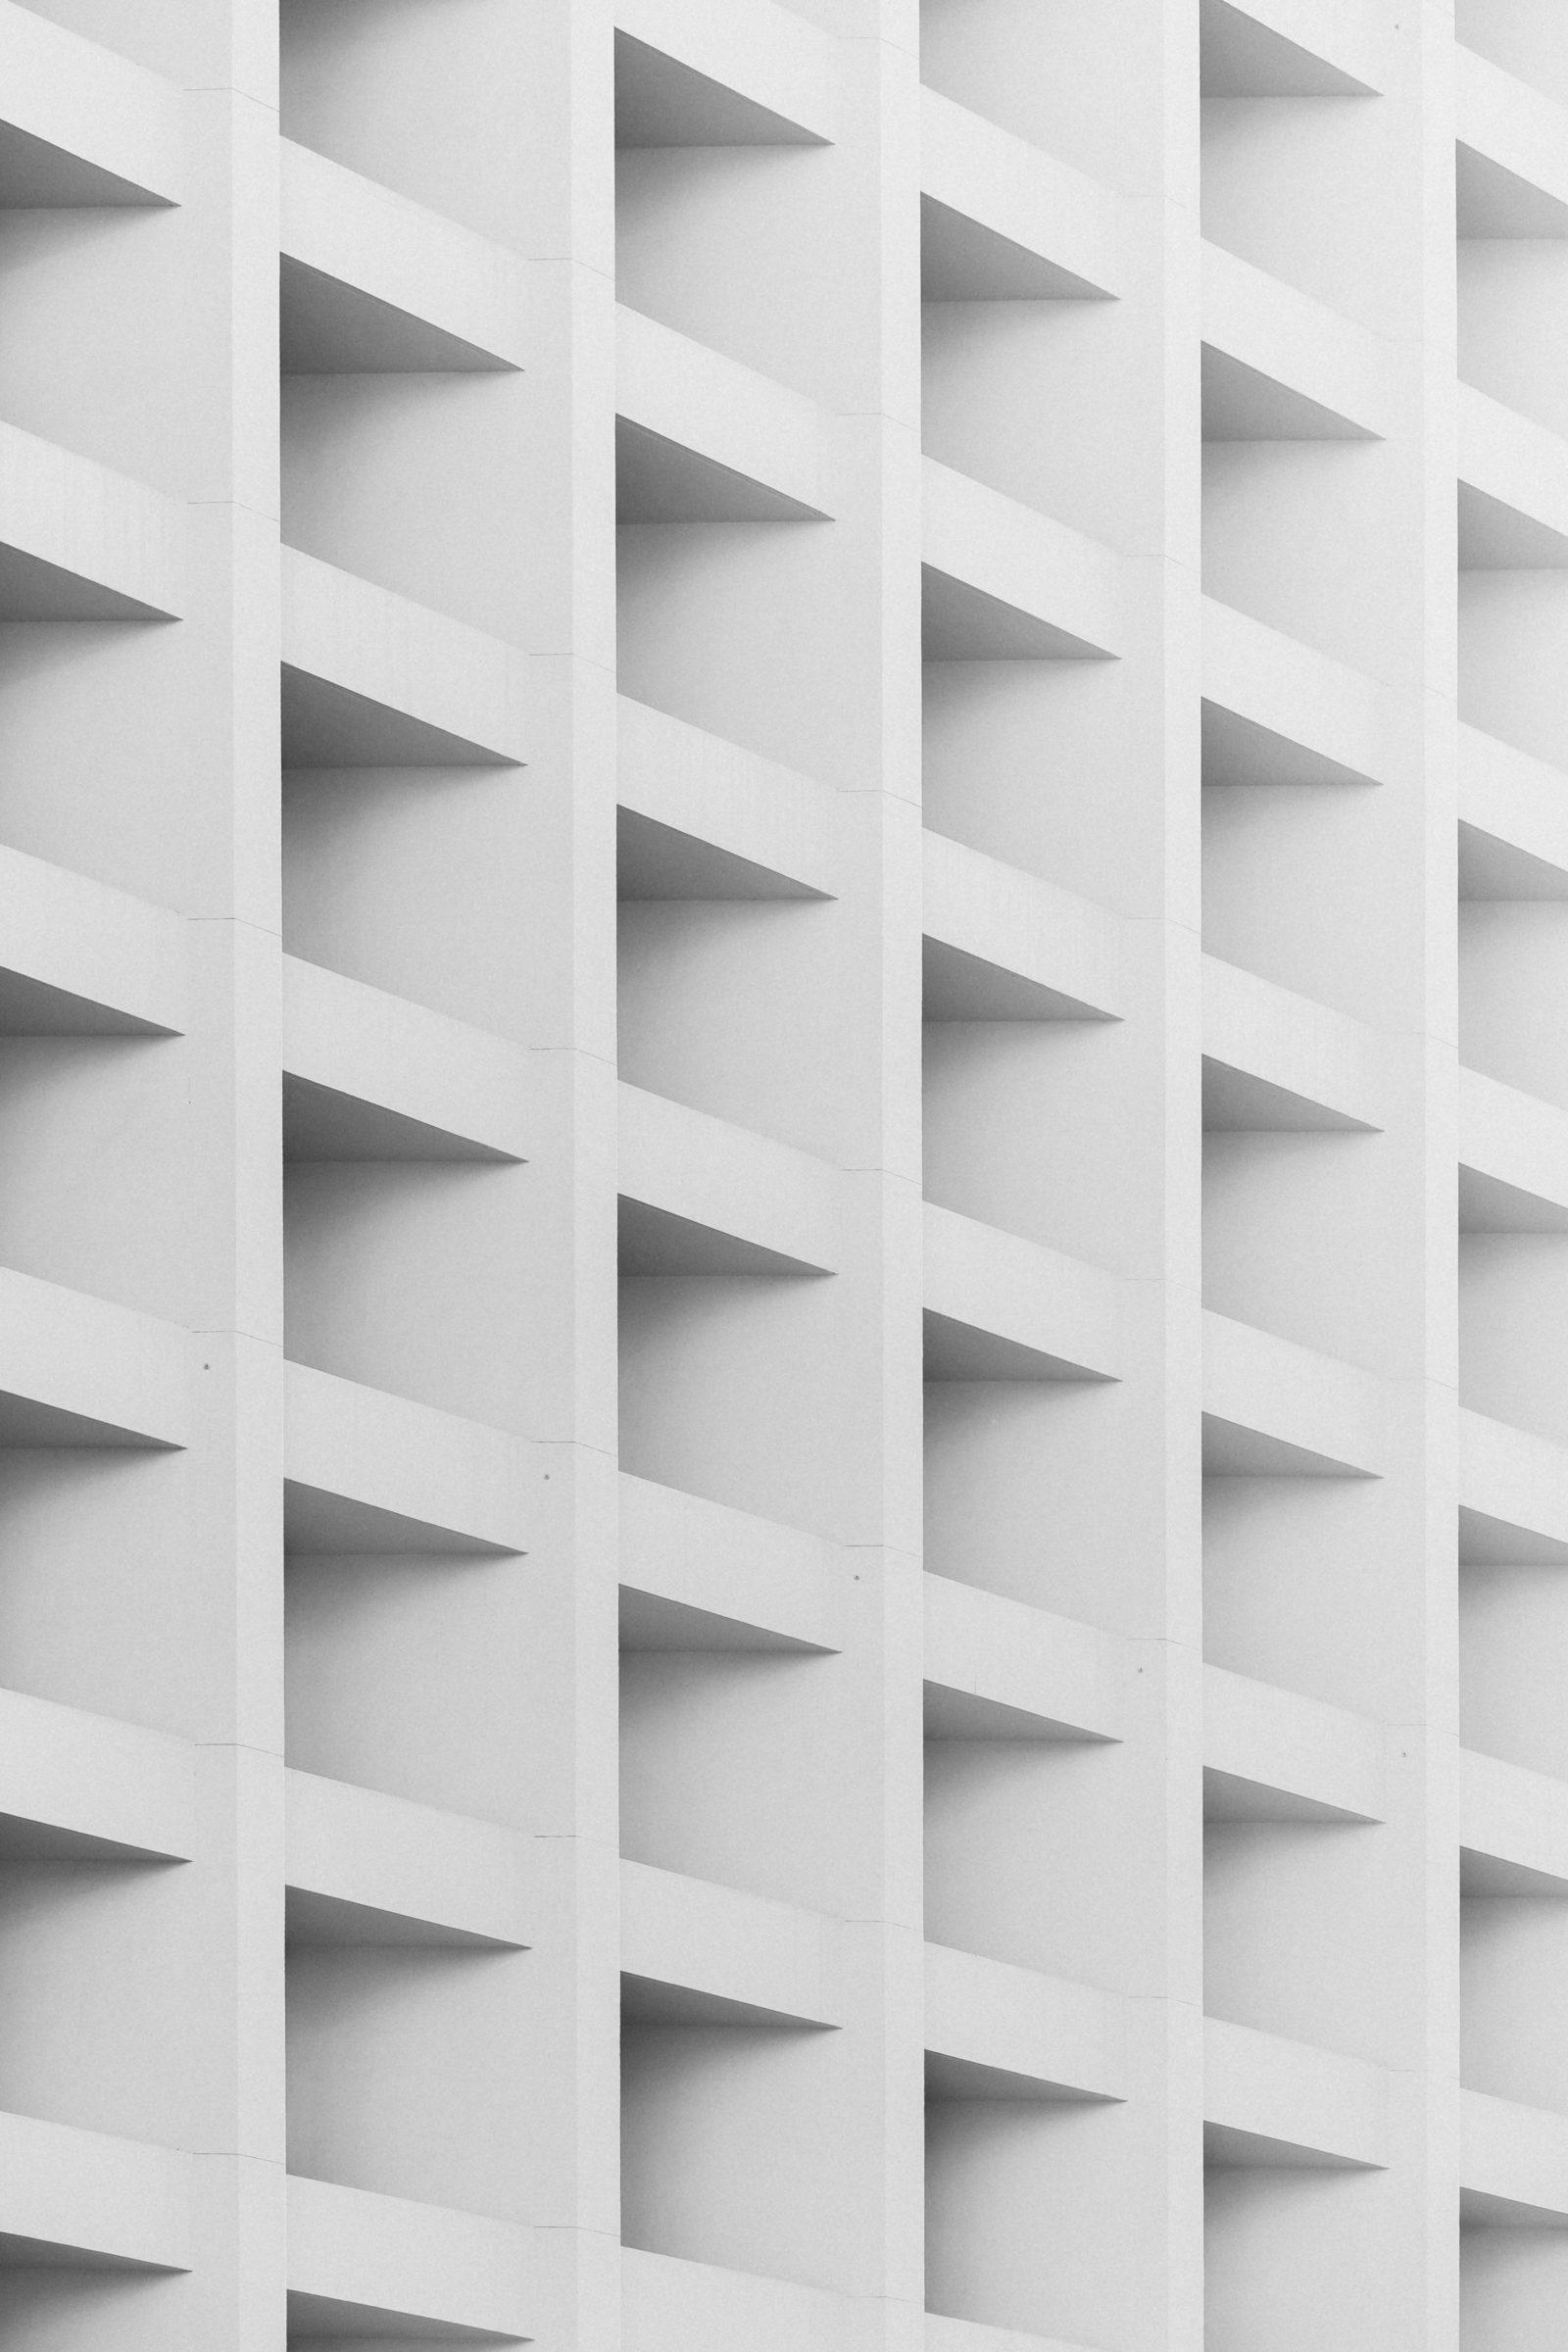 Architectural Cubes